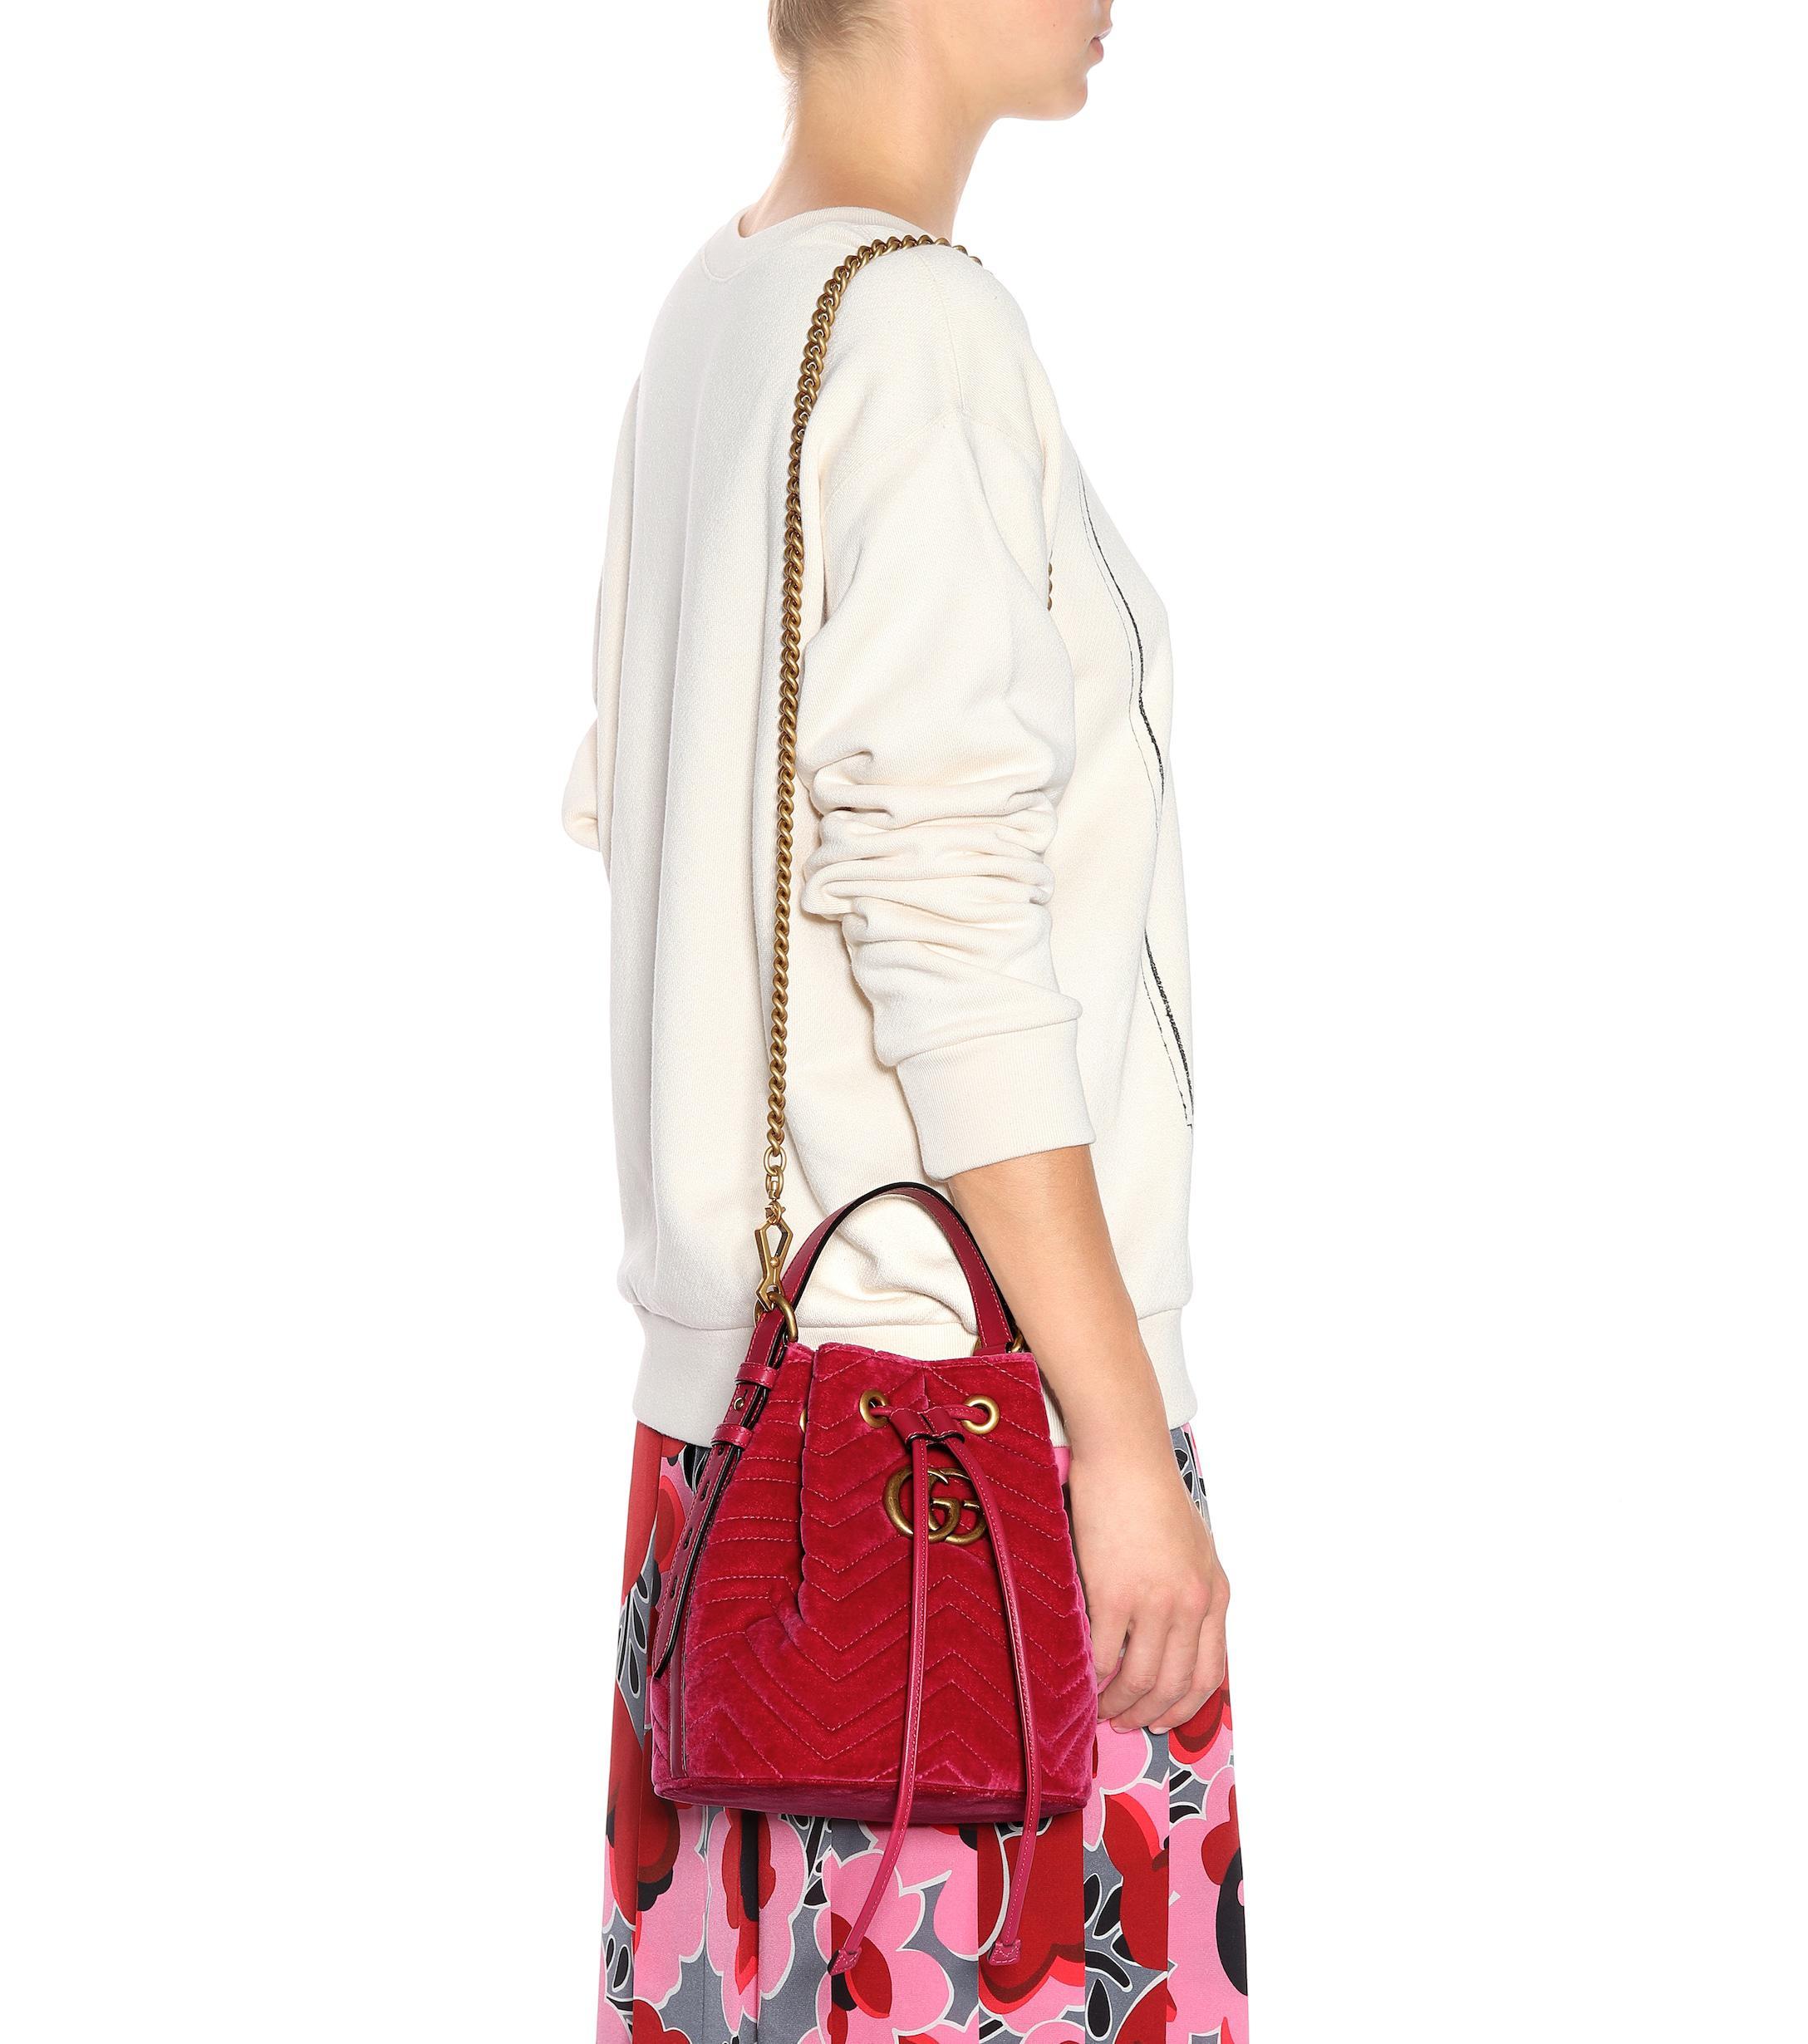 161bf7fc181 Gucci - Red GG Marmont Velvet Bucket Bag - Lyst. View fullscreen